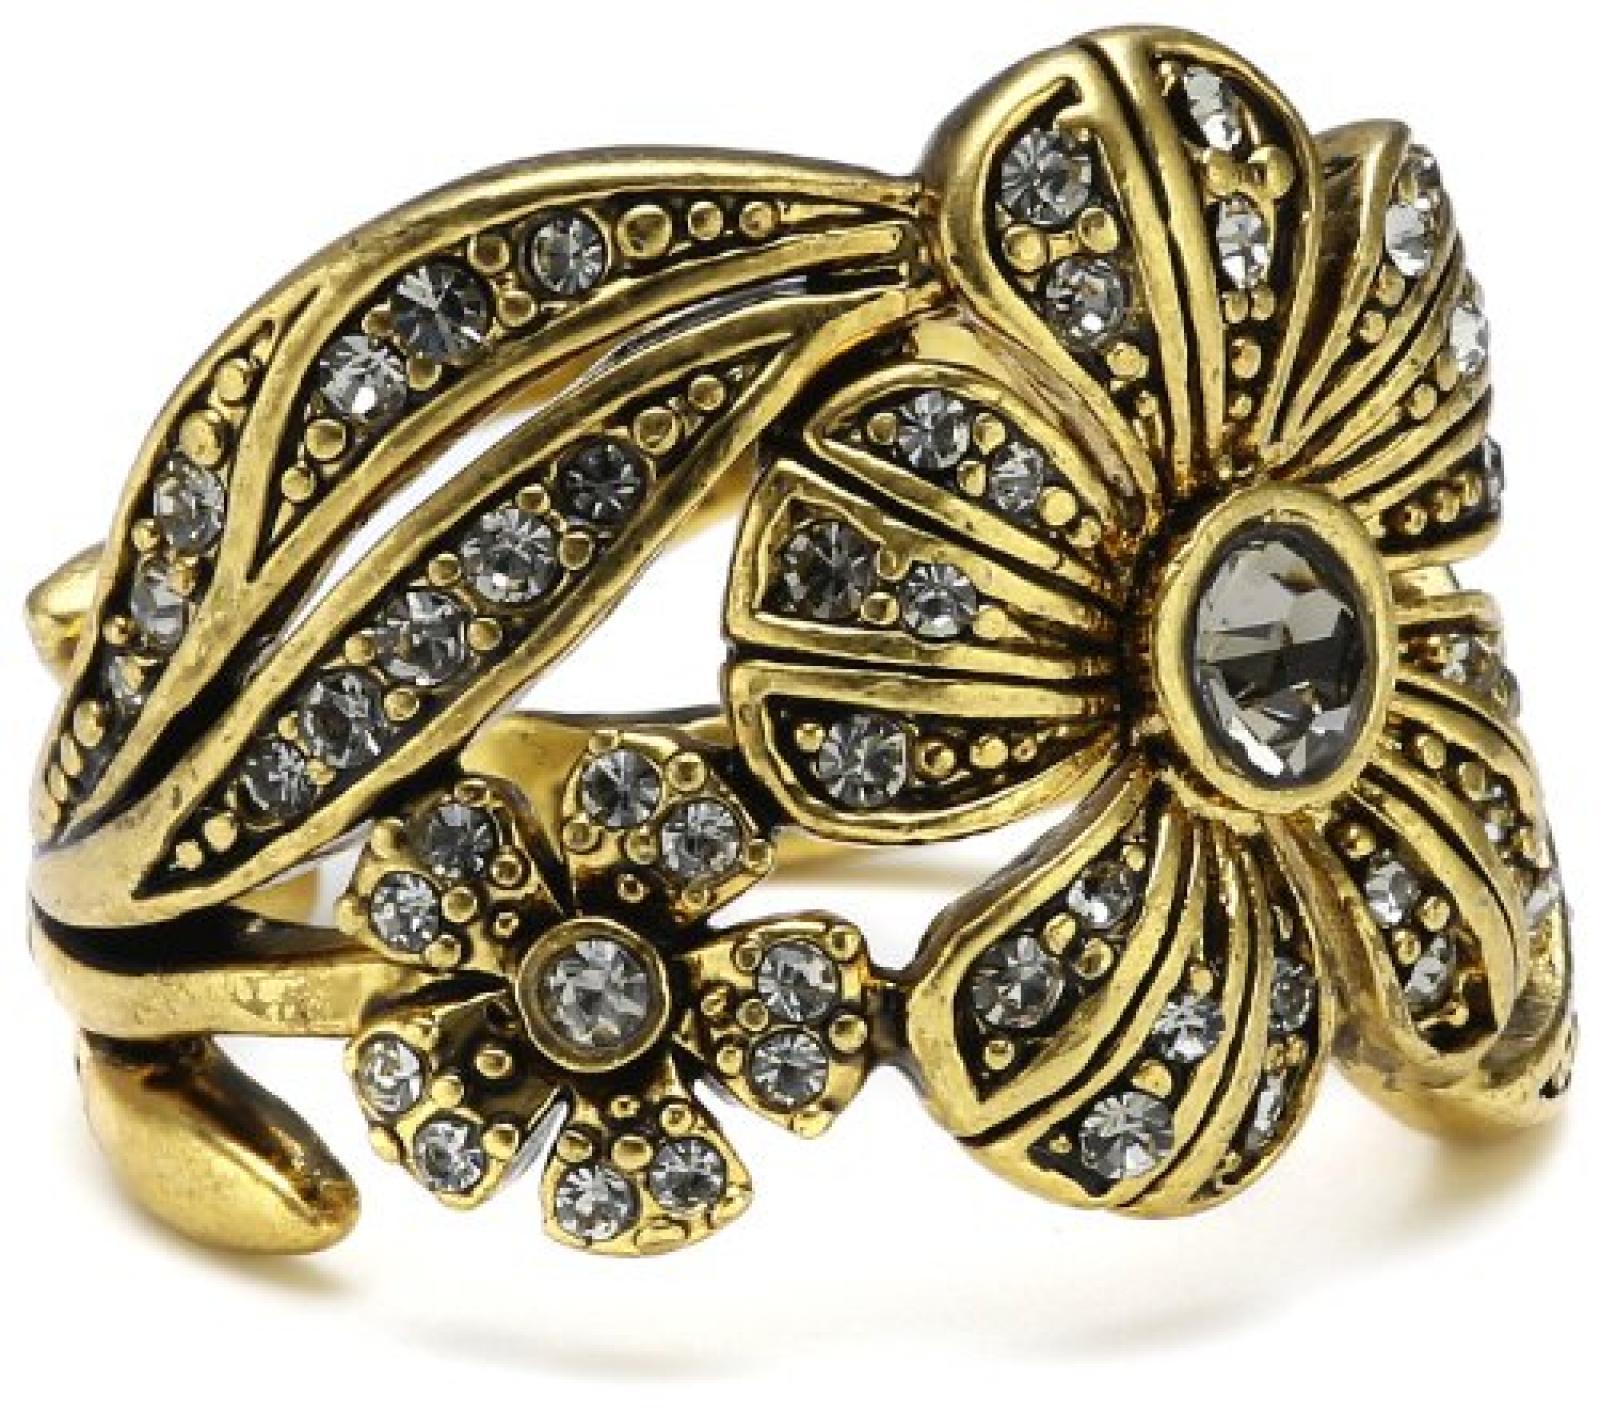 Pilgrim Jewelry Damen-Ring aus der Serie Desert flower vergoldet grau verstellbar 1.6 cm 121232104